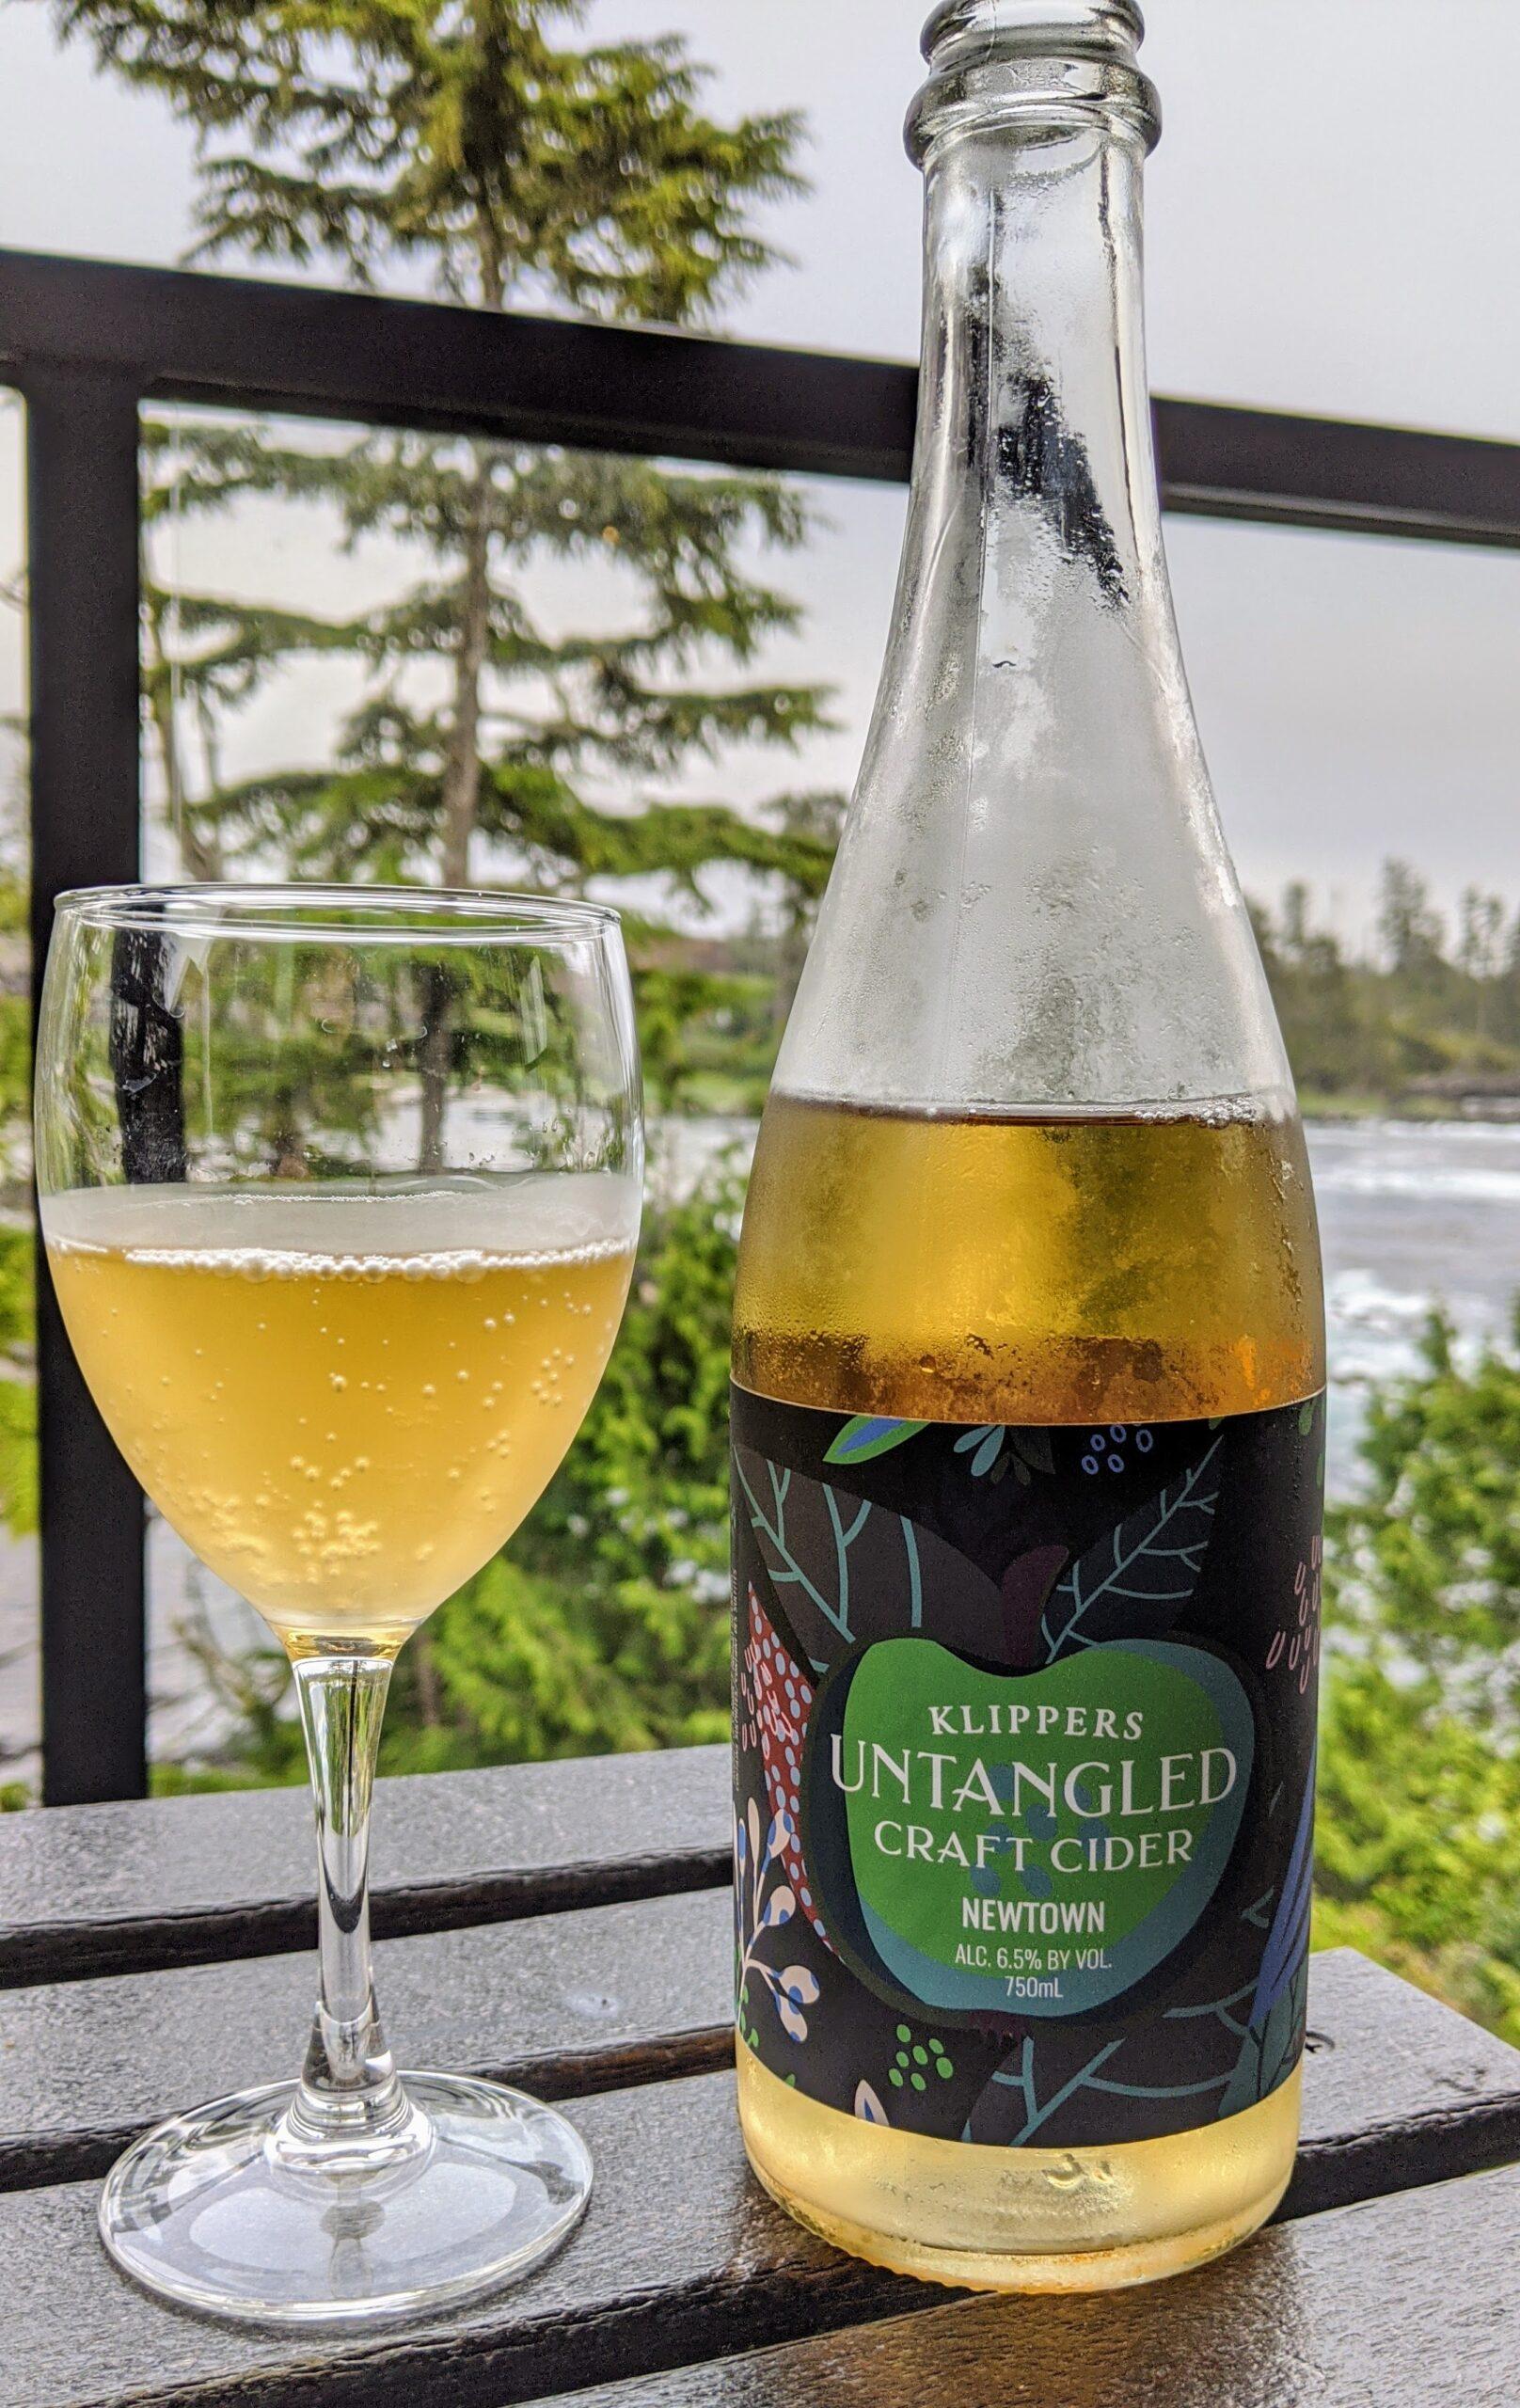 Untangled Cider